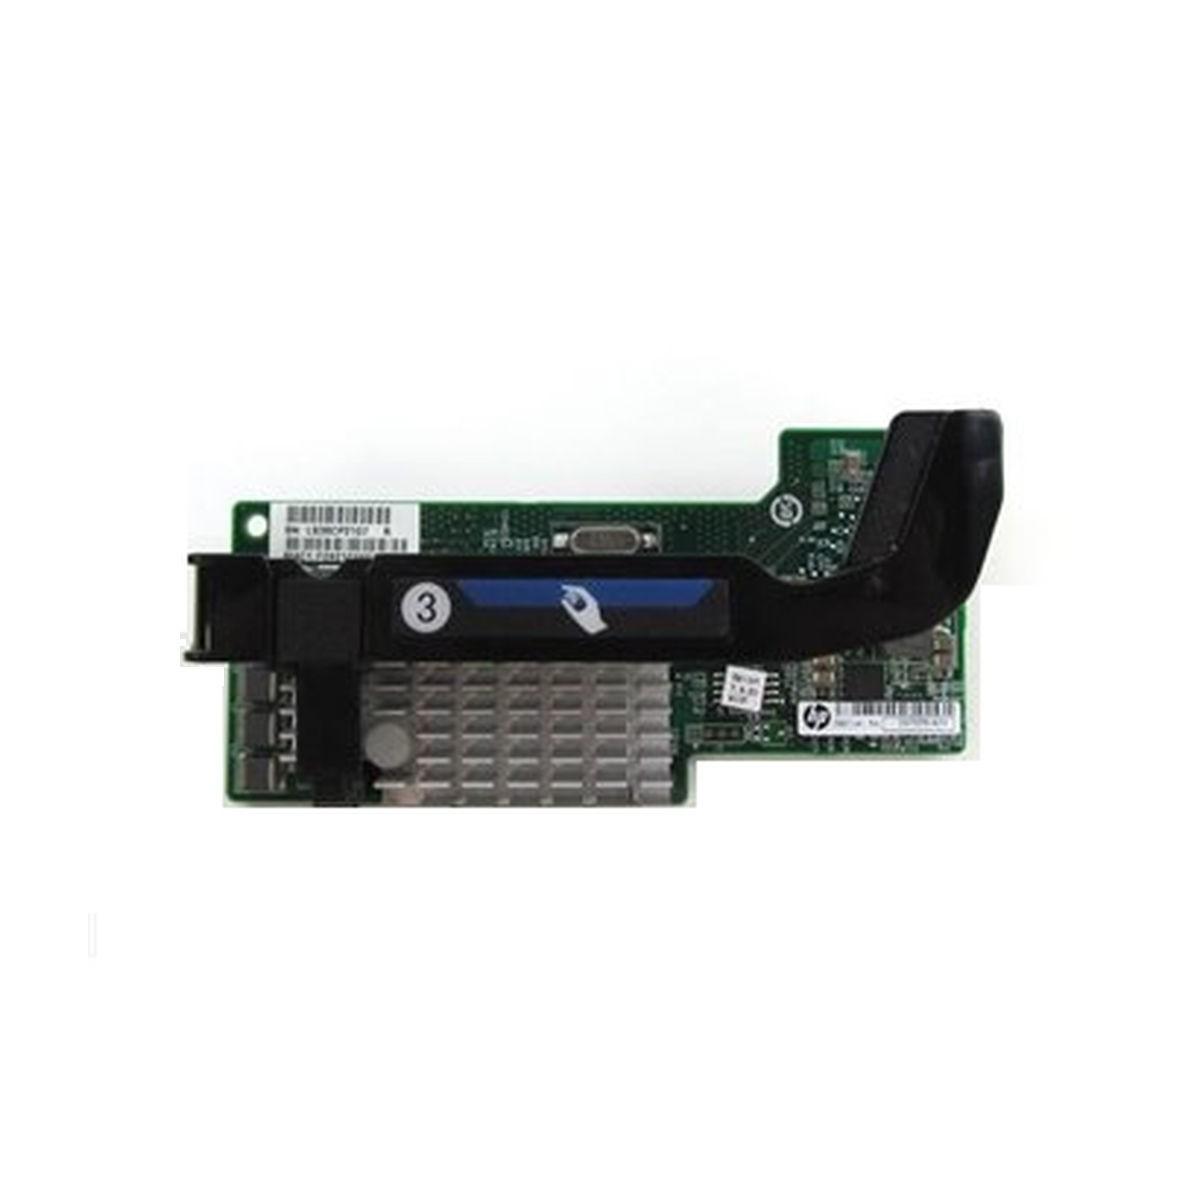 FUJITSU LSI LOGIC MEGARAID MR SAS 8300XLP PCI-X